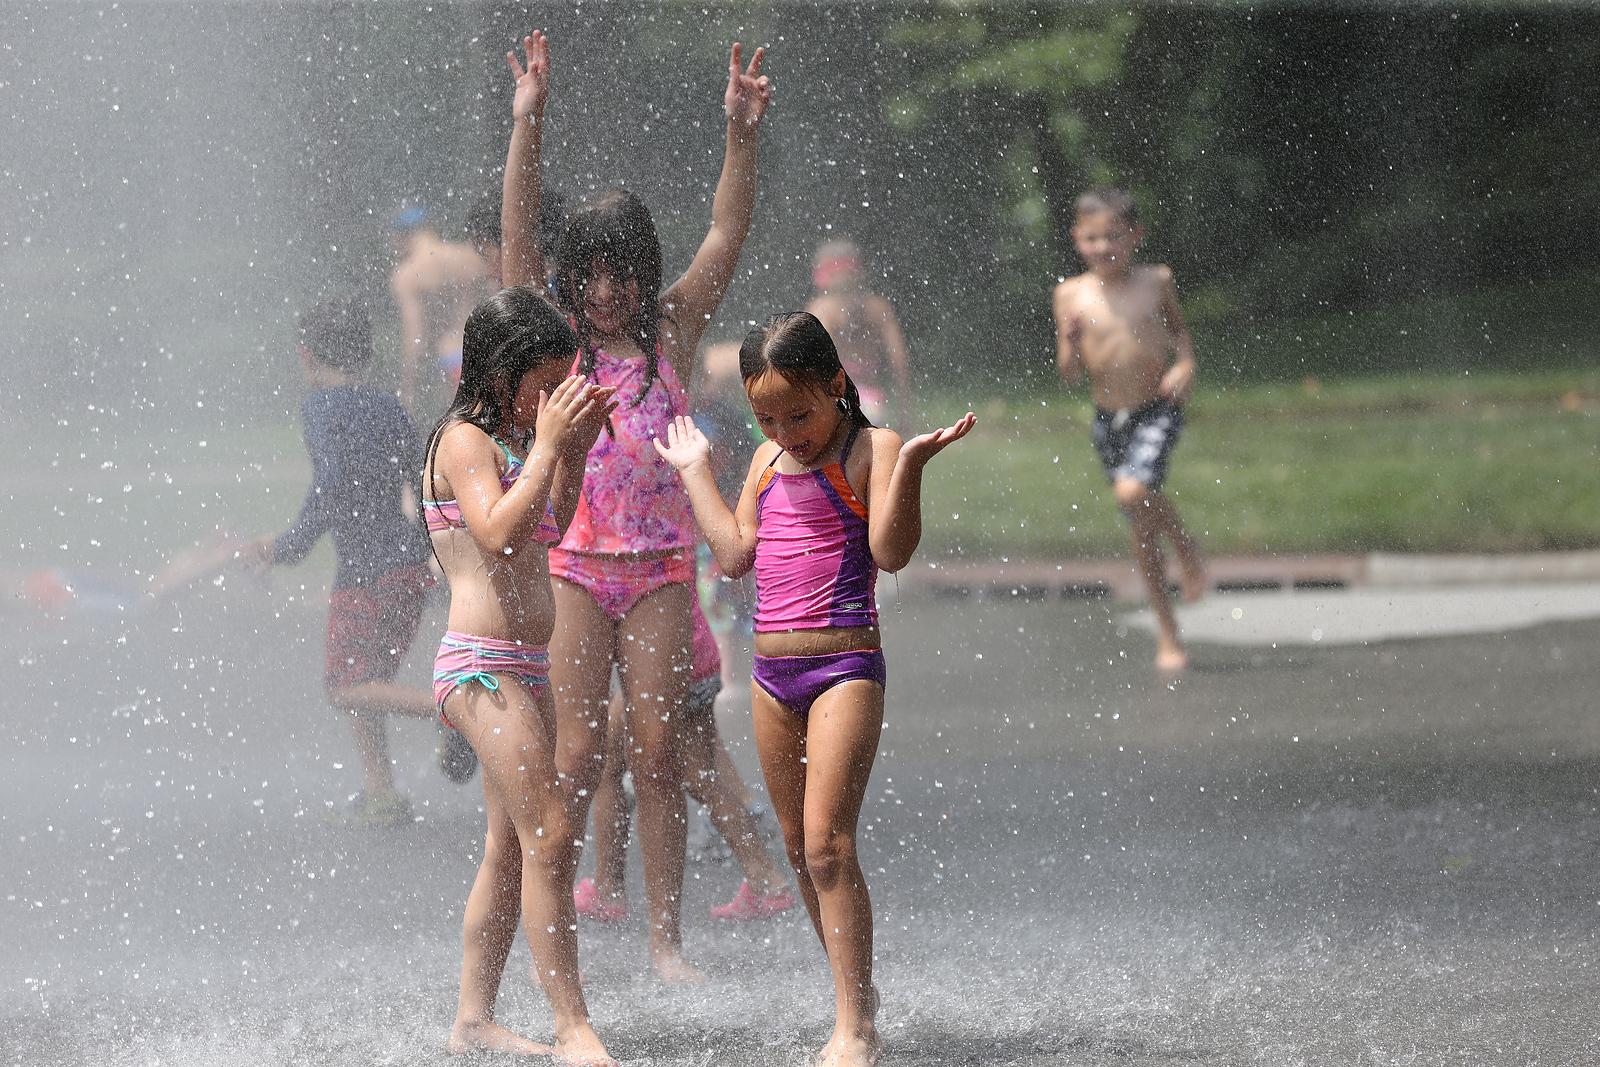 Buckingham Park 4th of July Celebration. Photos by Donn Jones Photography